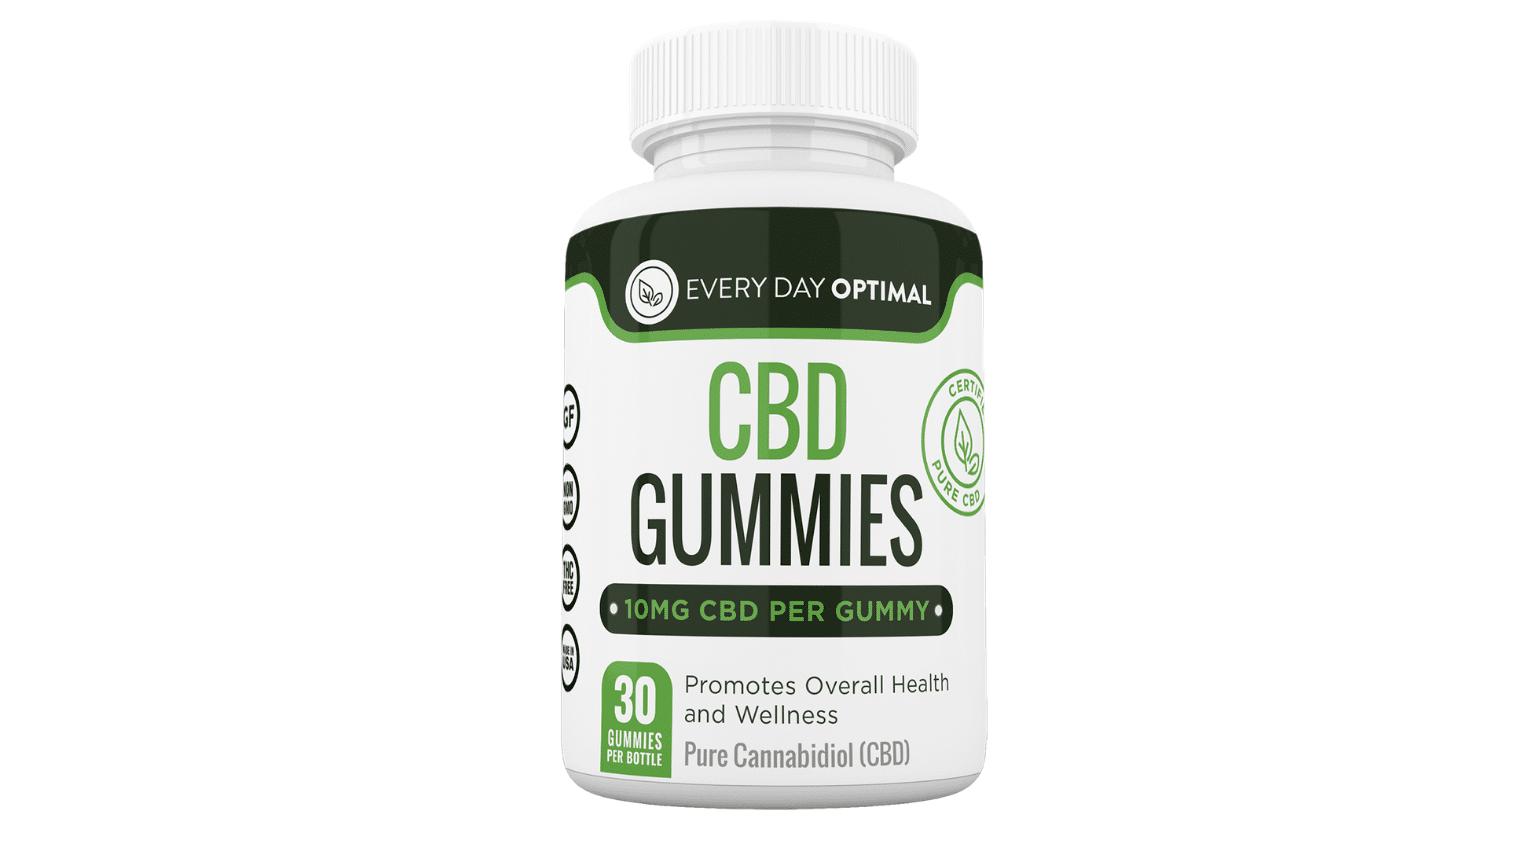 every-day-optimal-cbd-gummies